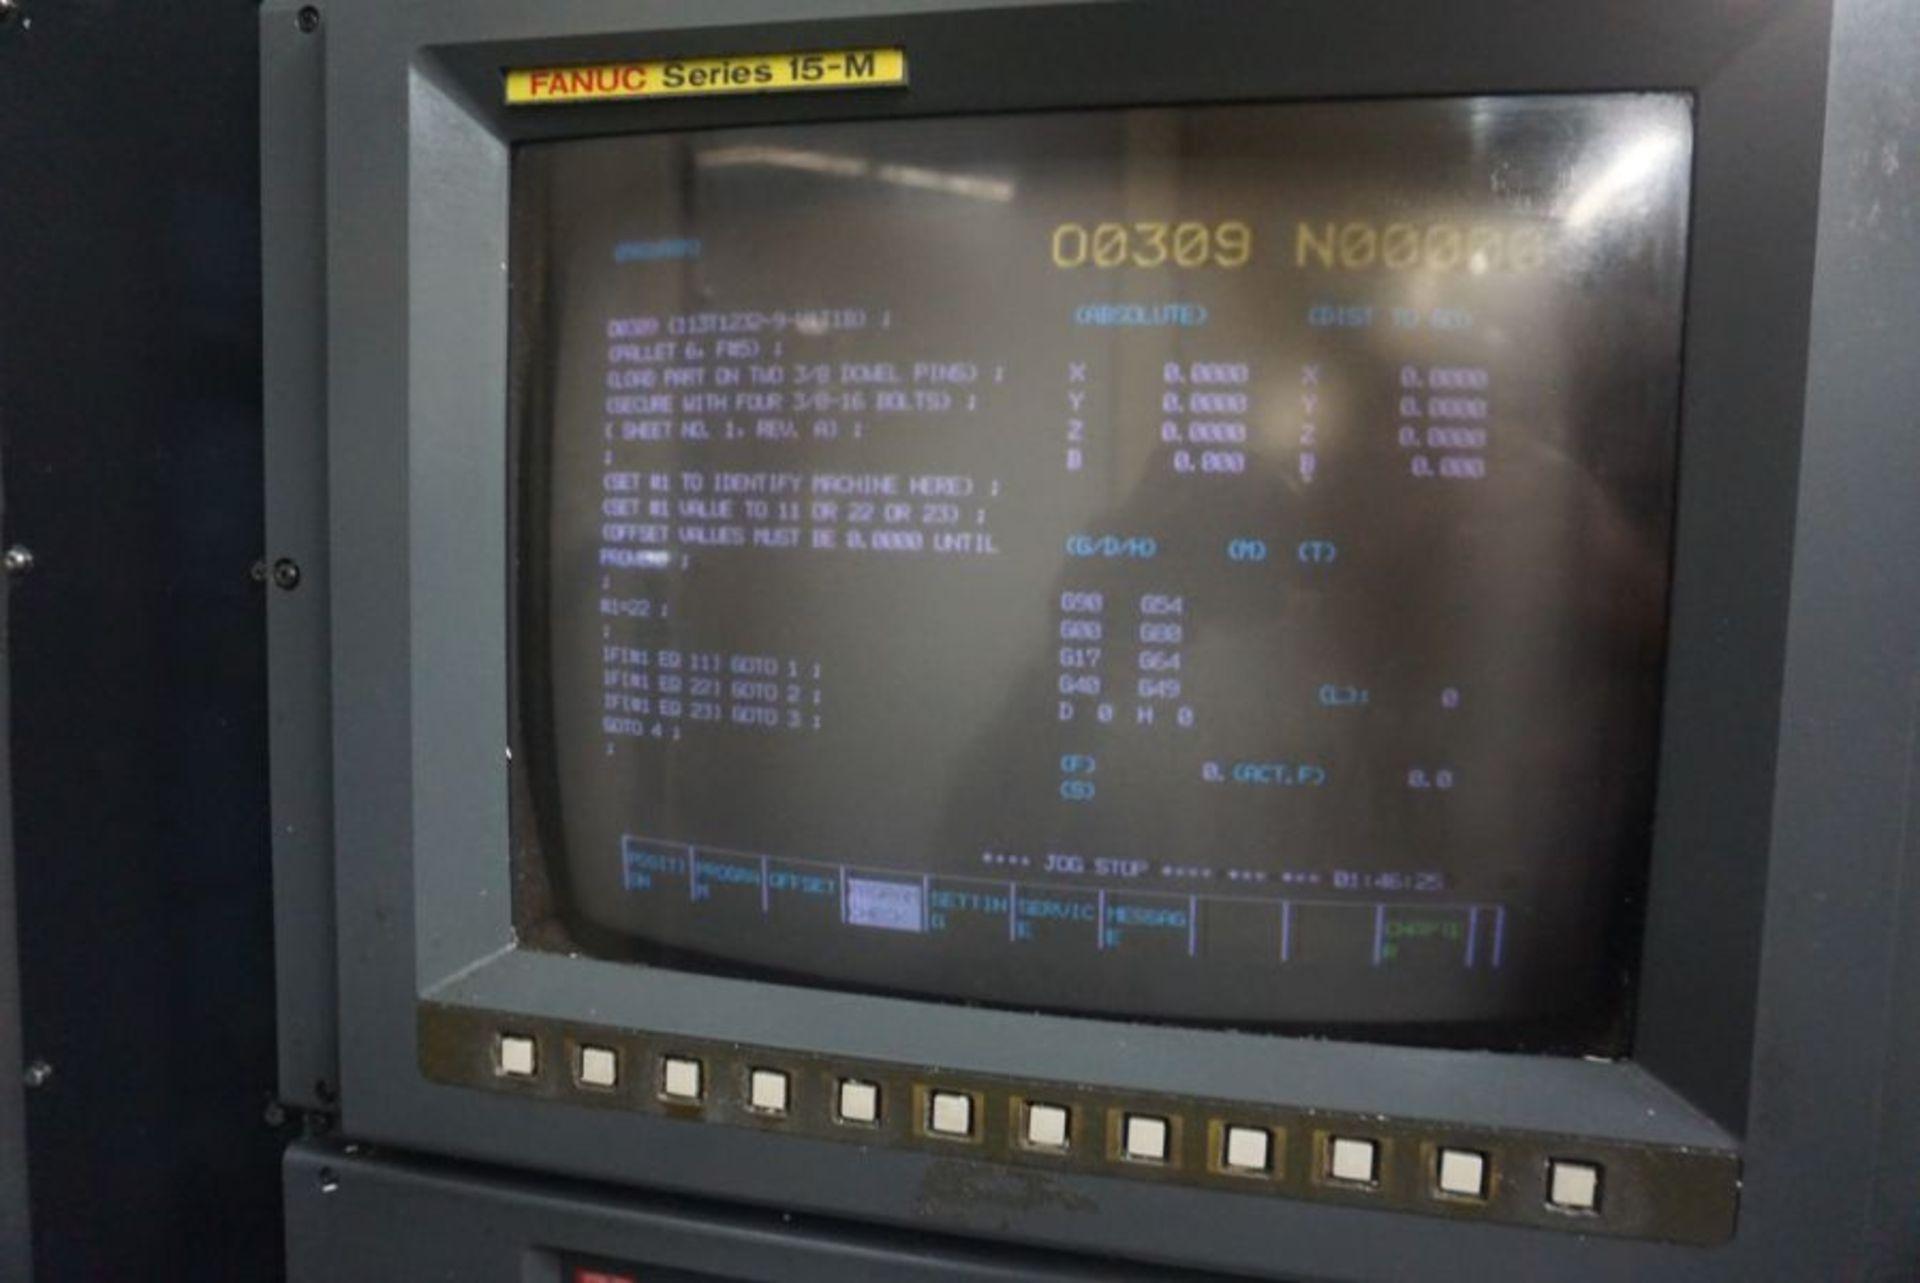 Makino MC98-A120 4-Axis Horizontal Machining Center, Fanuc 16 Pro 3 Control, New 1990 - Image 7 of 8